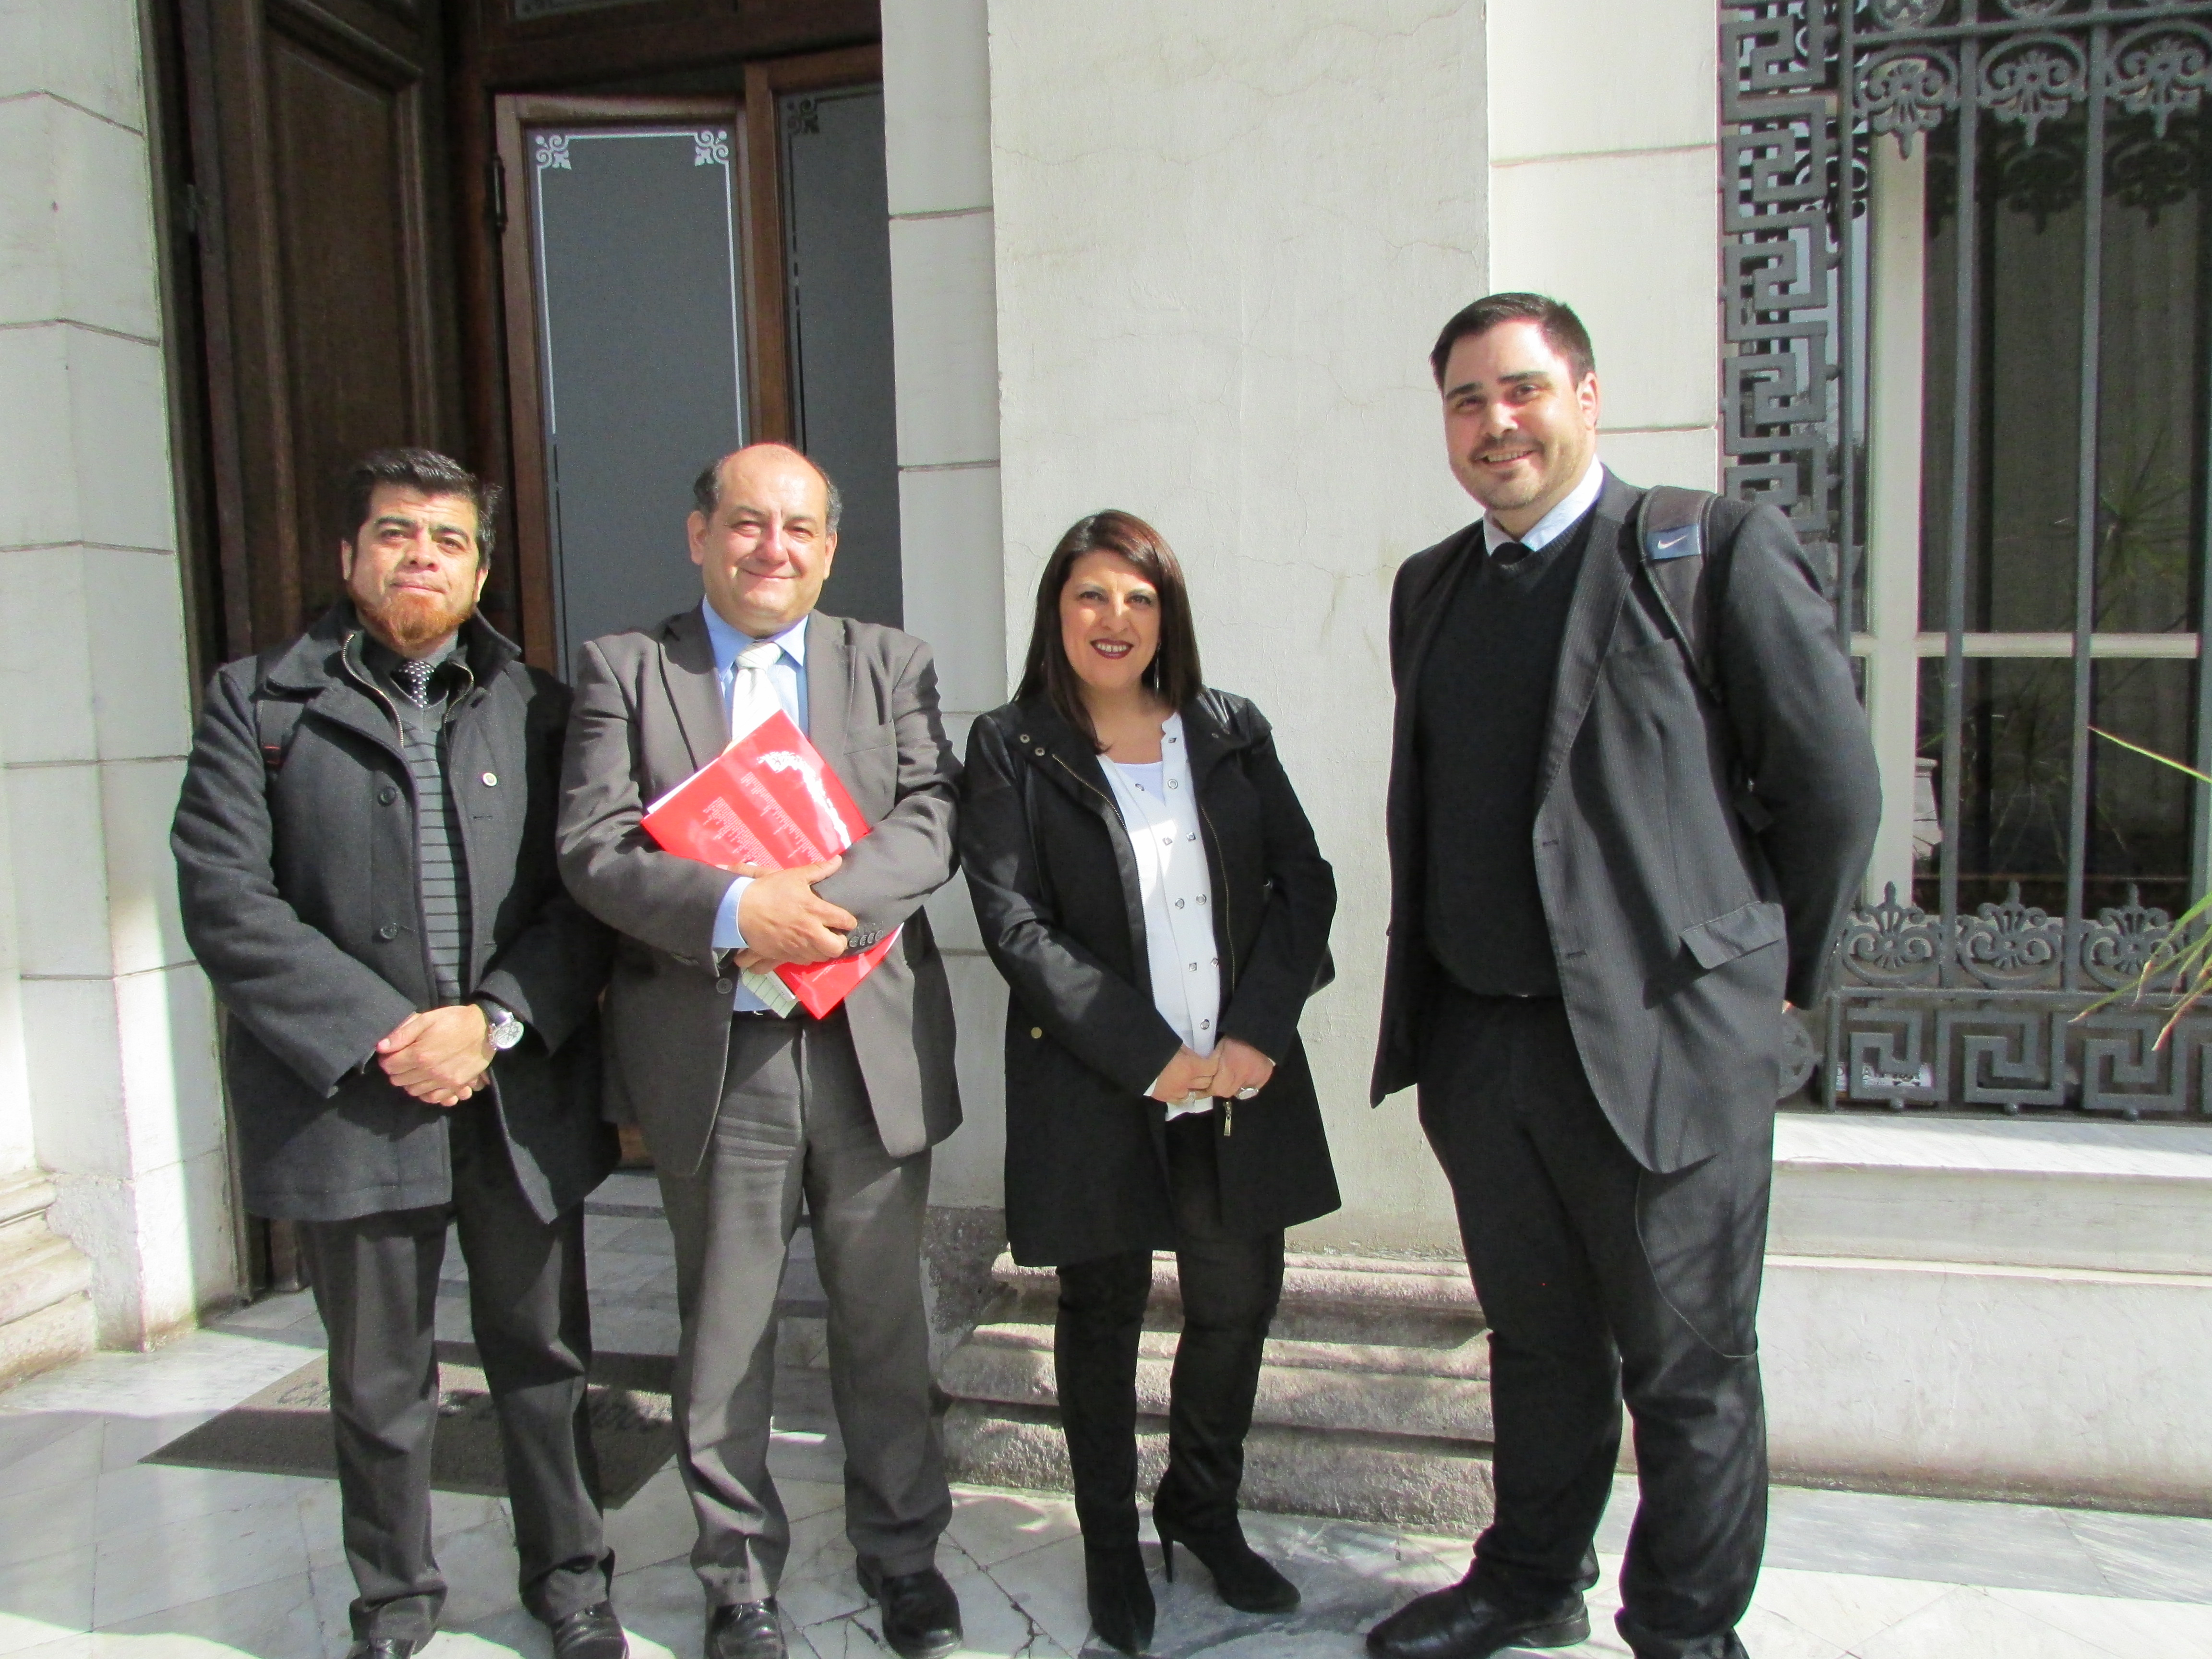 AFUDEP con Diputados Soto, Gutierrez y Coloma por proyecto Homologación Práctica Profesional – Mayo 2018